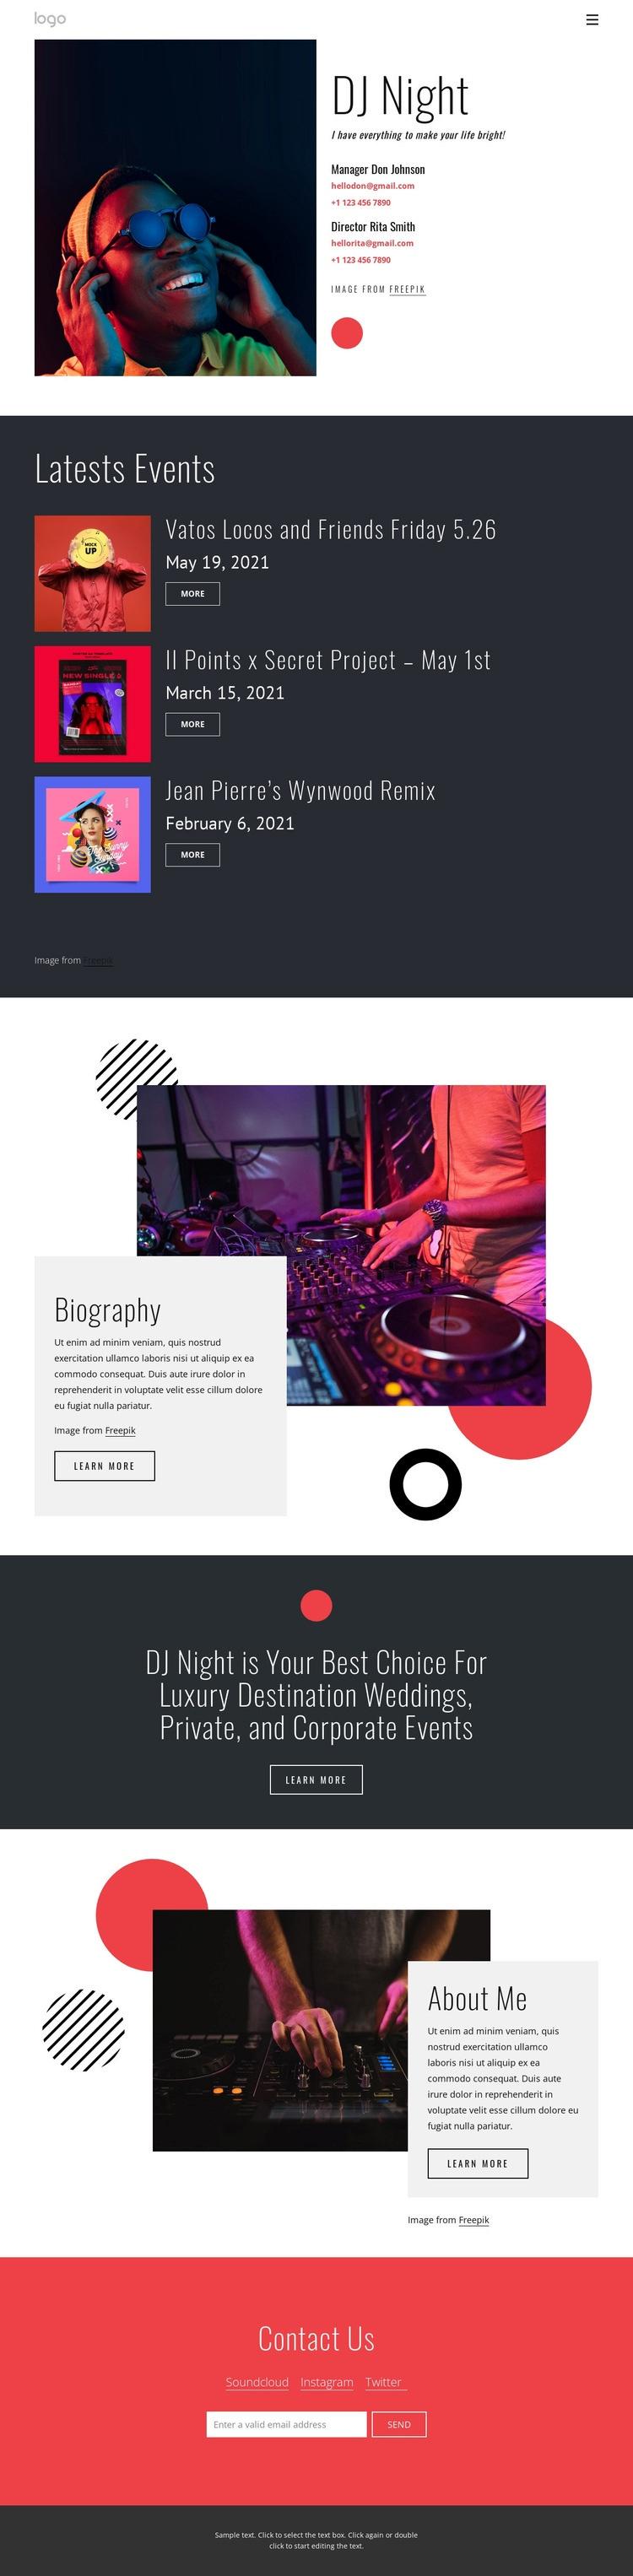 Dj night website Web Page Designer